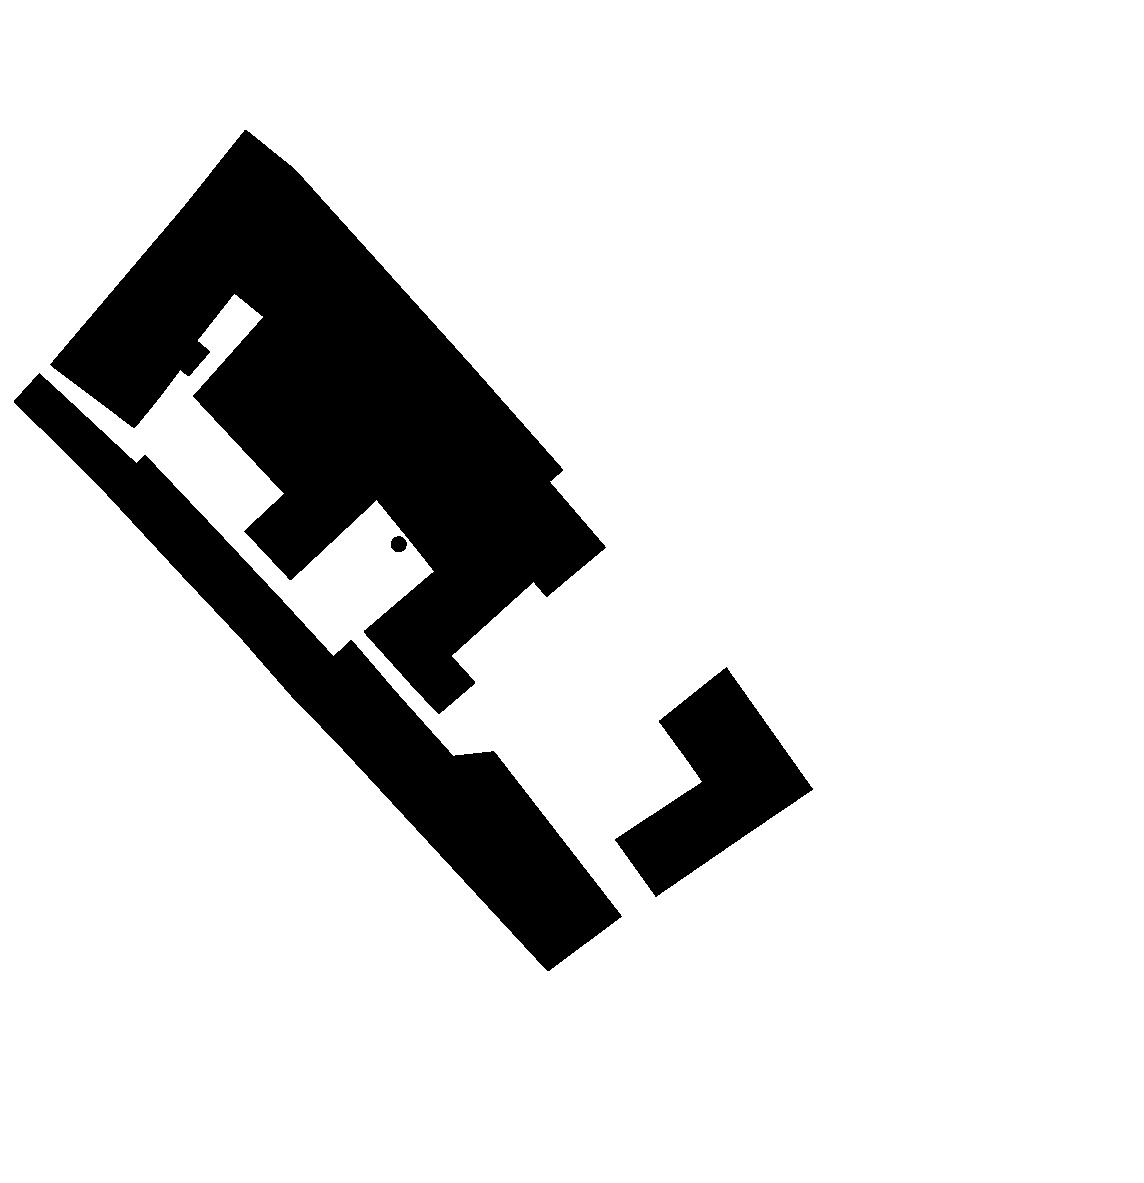 mv-01.png